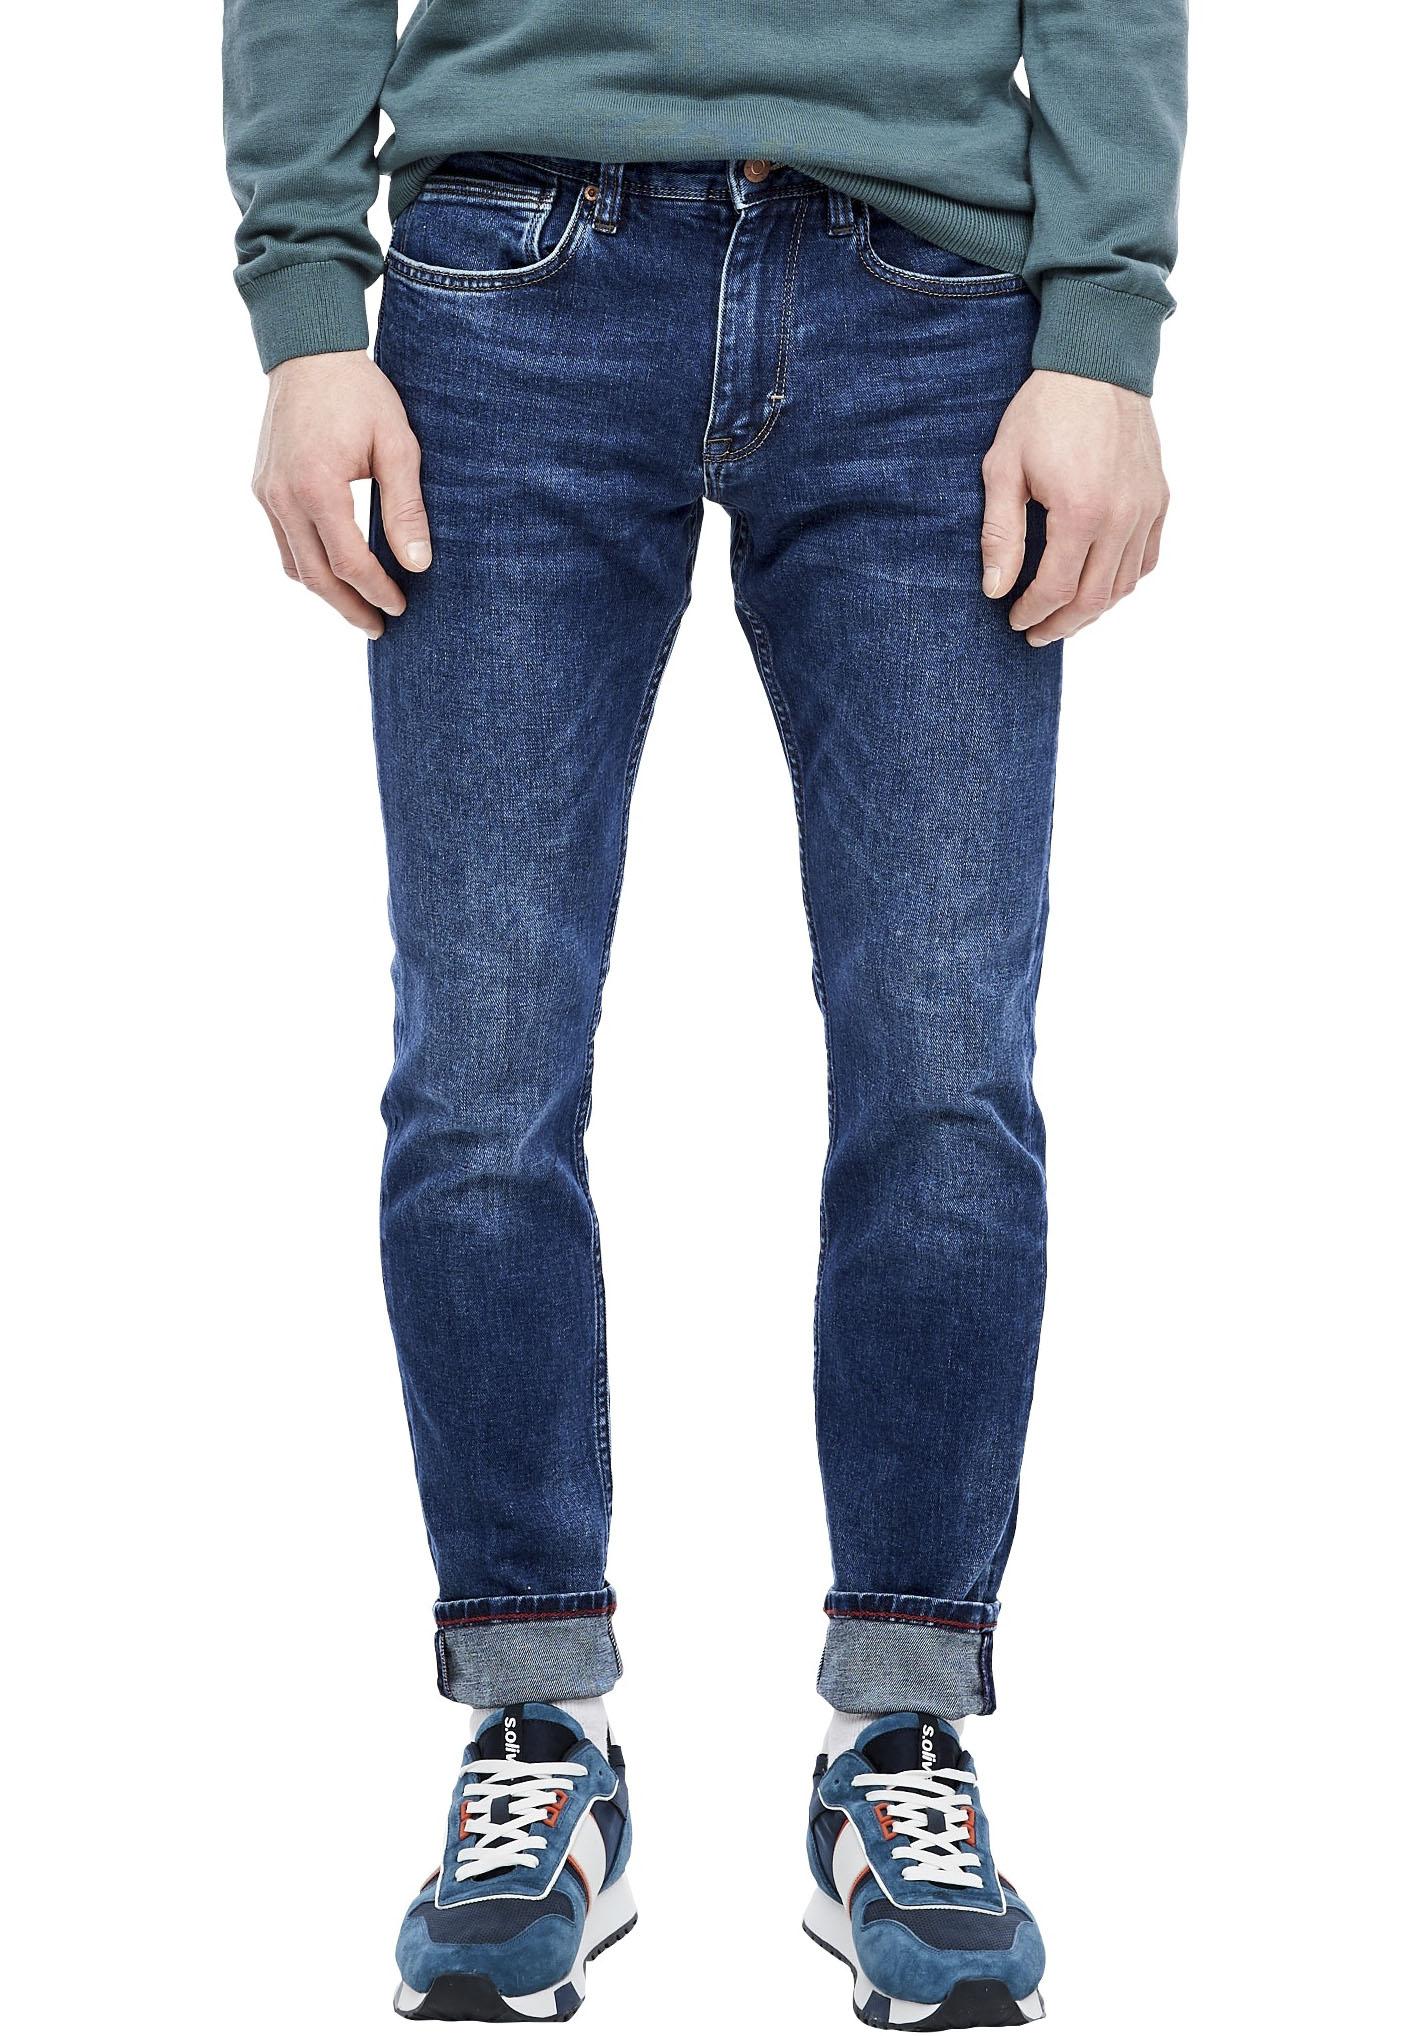 s.oliver -  5-Pocket-Jeans, authentische Waschung